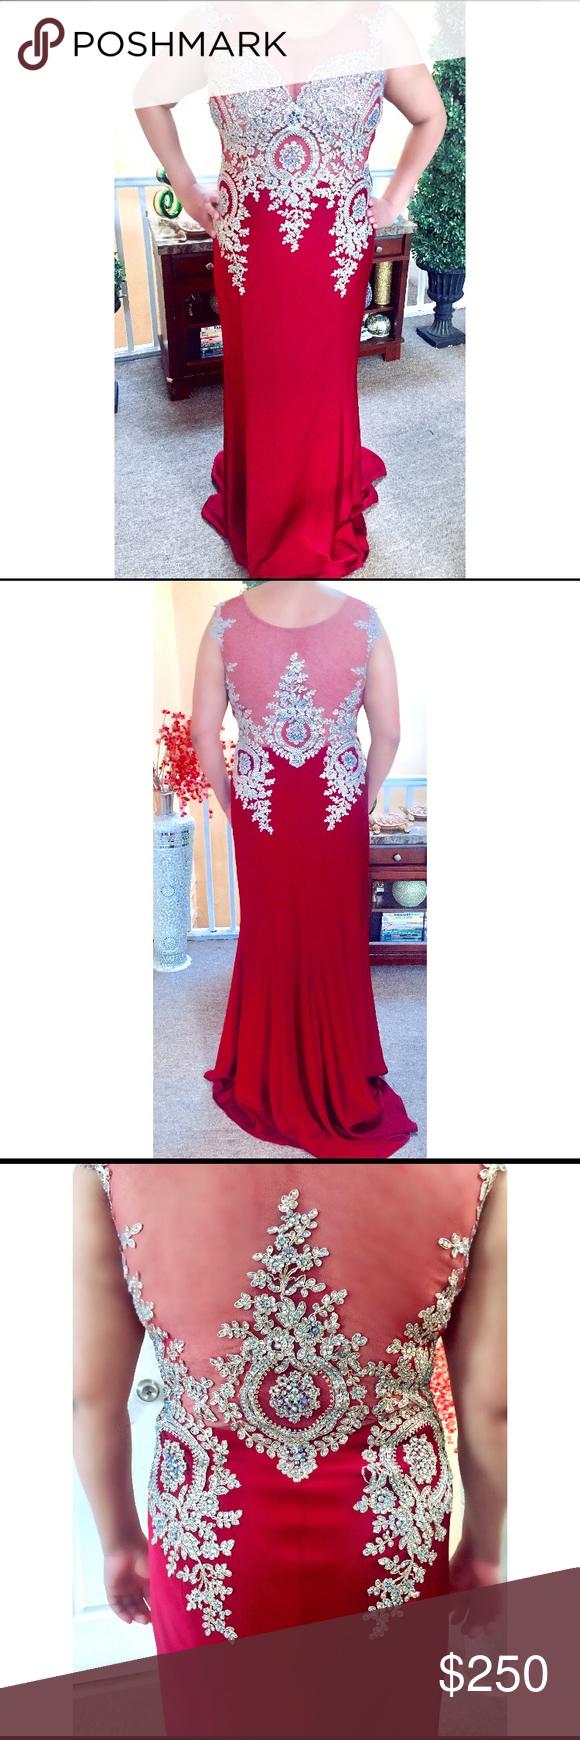 wine red prom dress my posh picks pinterest size